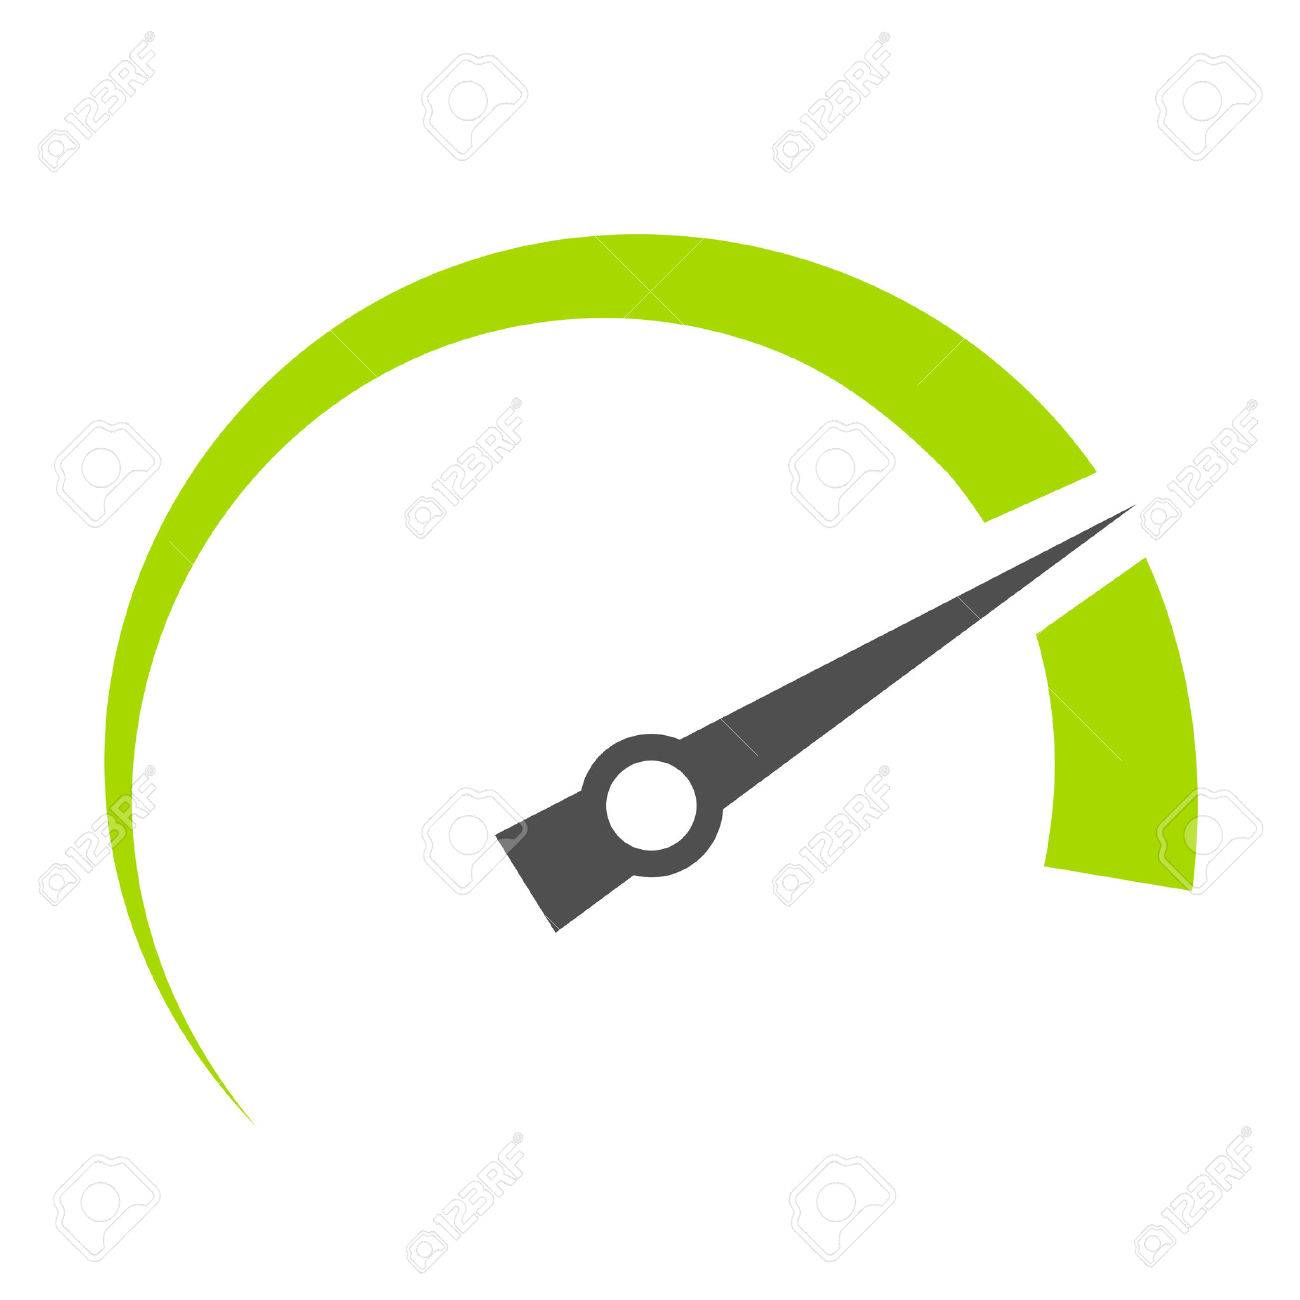 speedometer vector symbol royalty free cliparts vectors and stock rh 123rf com speedometer vector graphic speedometer vector graphic